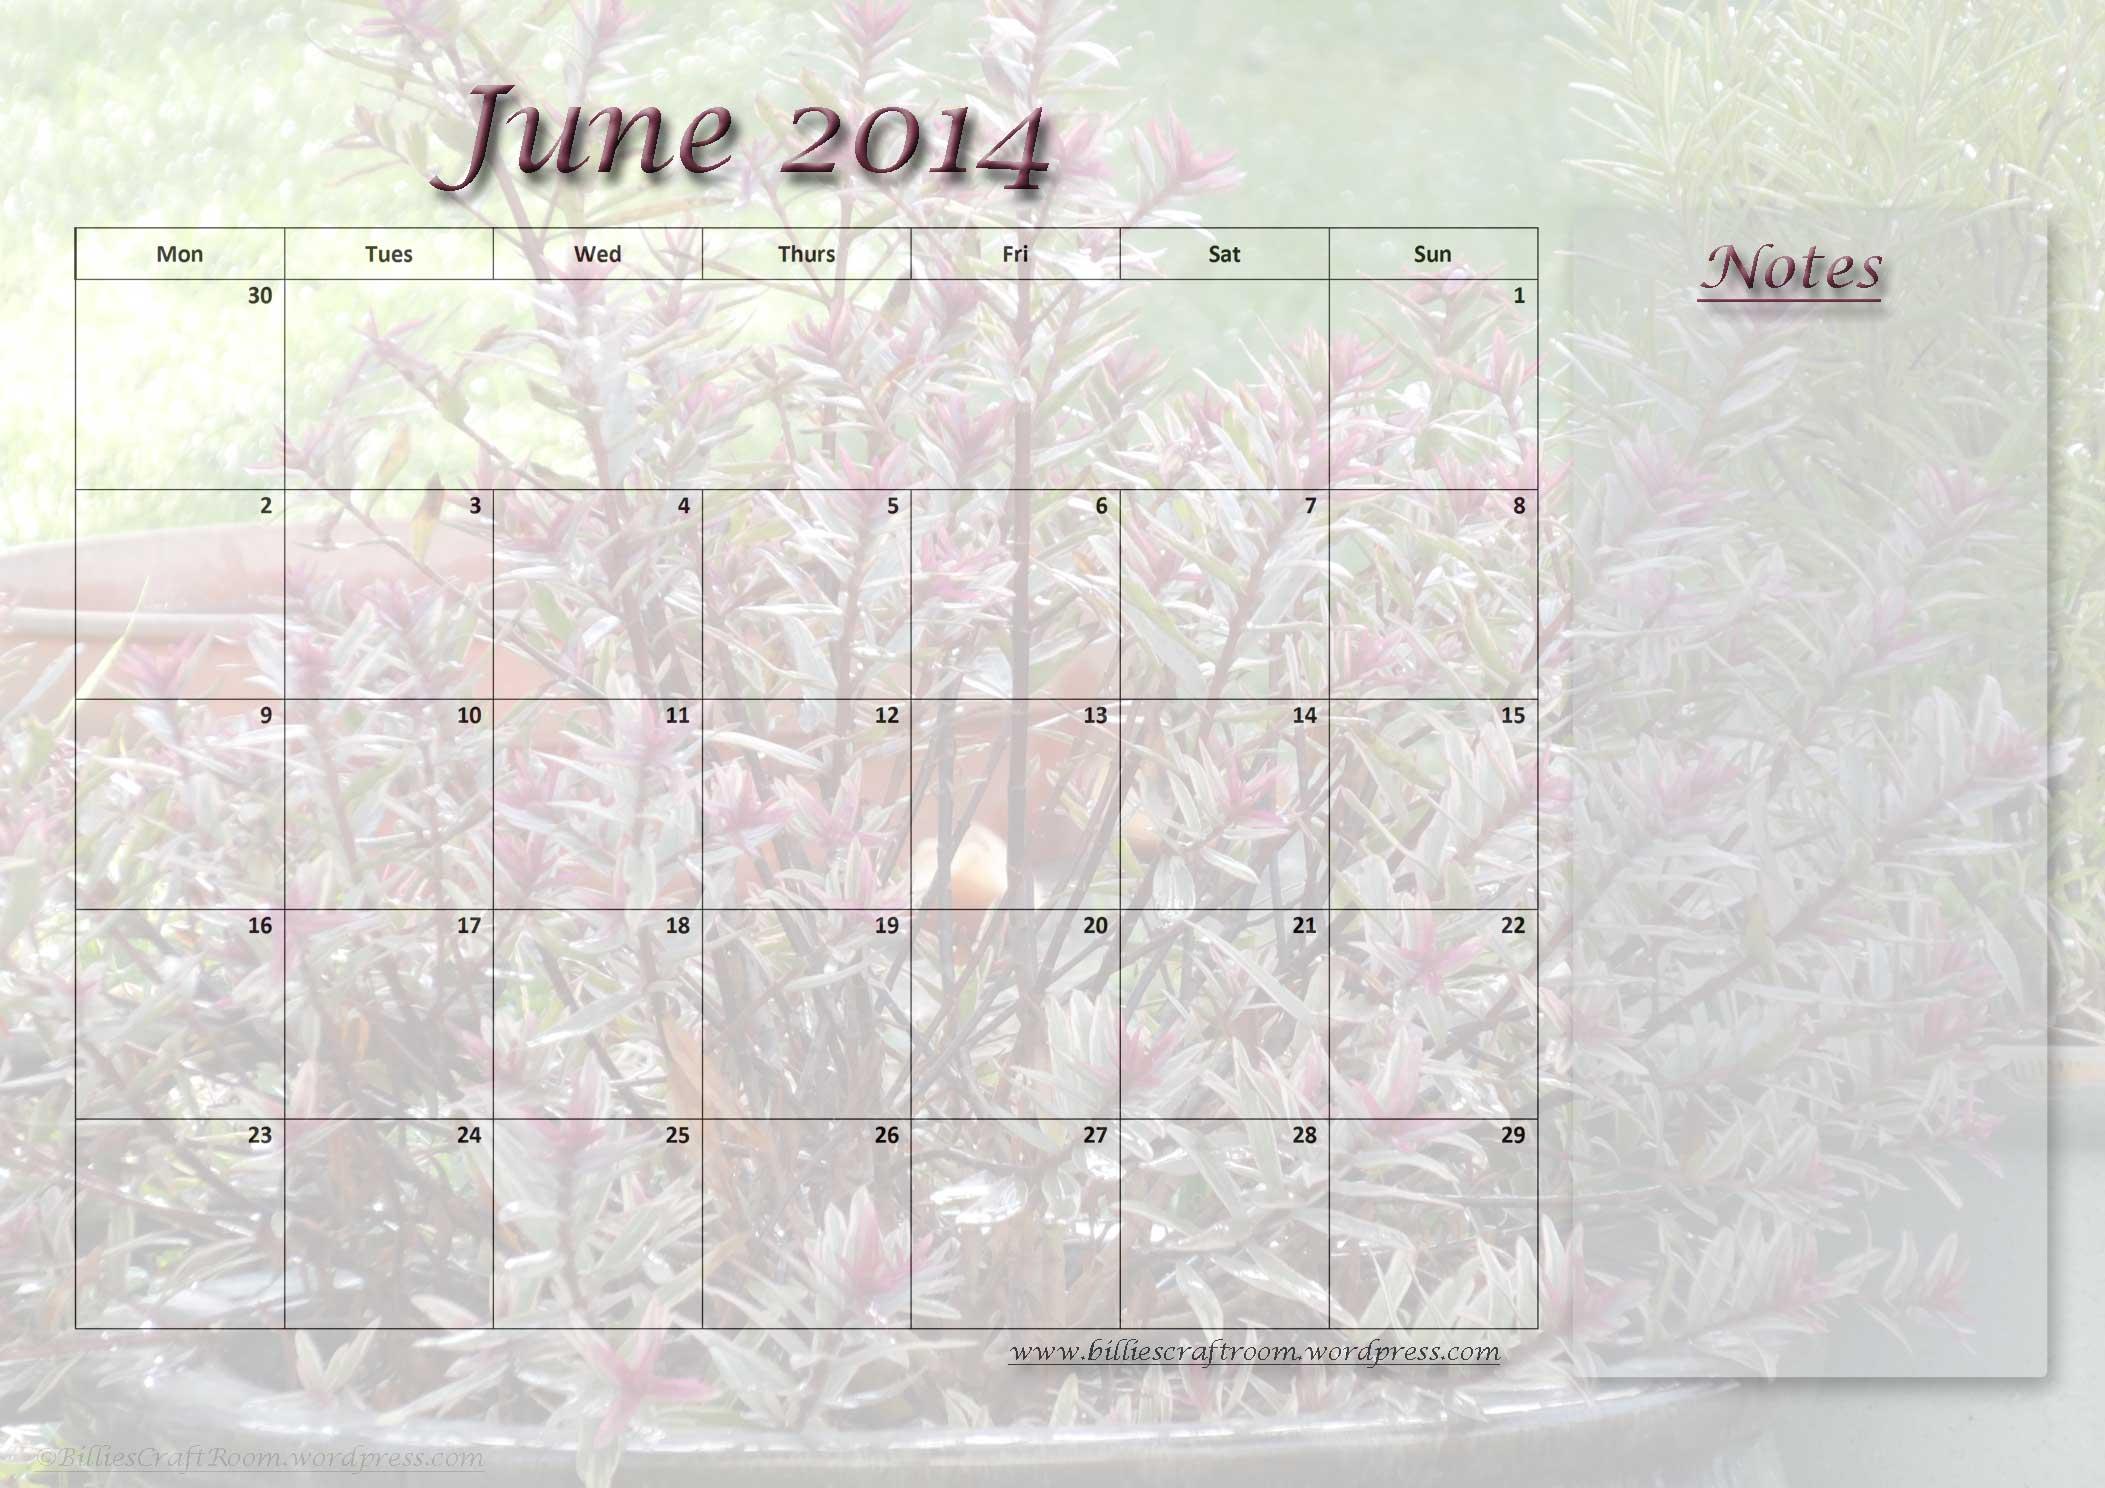 Full Page June 2014 Calendar